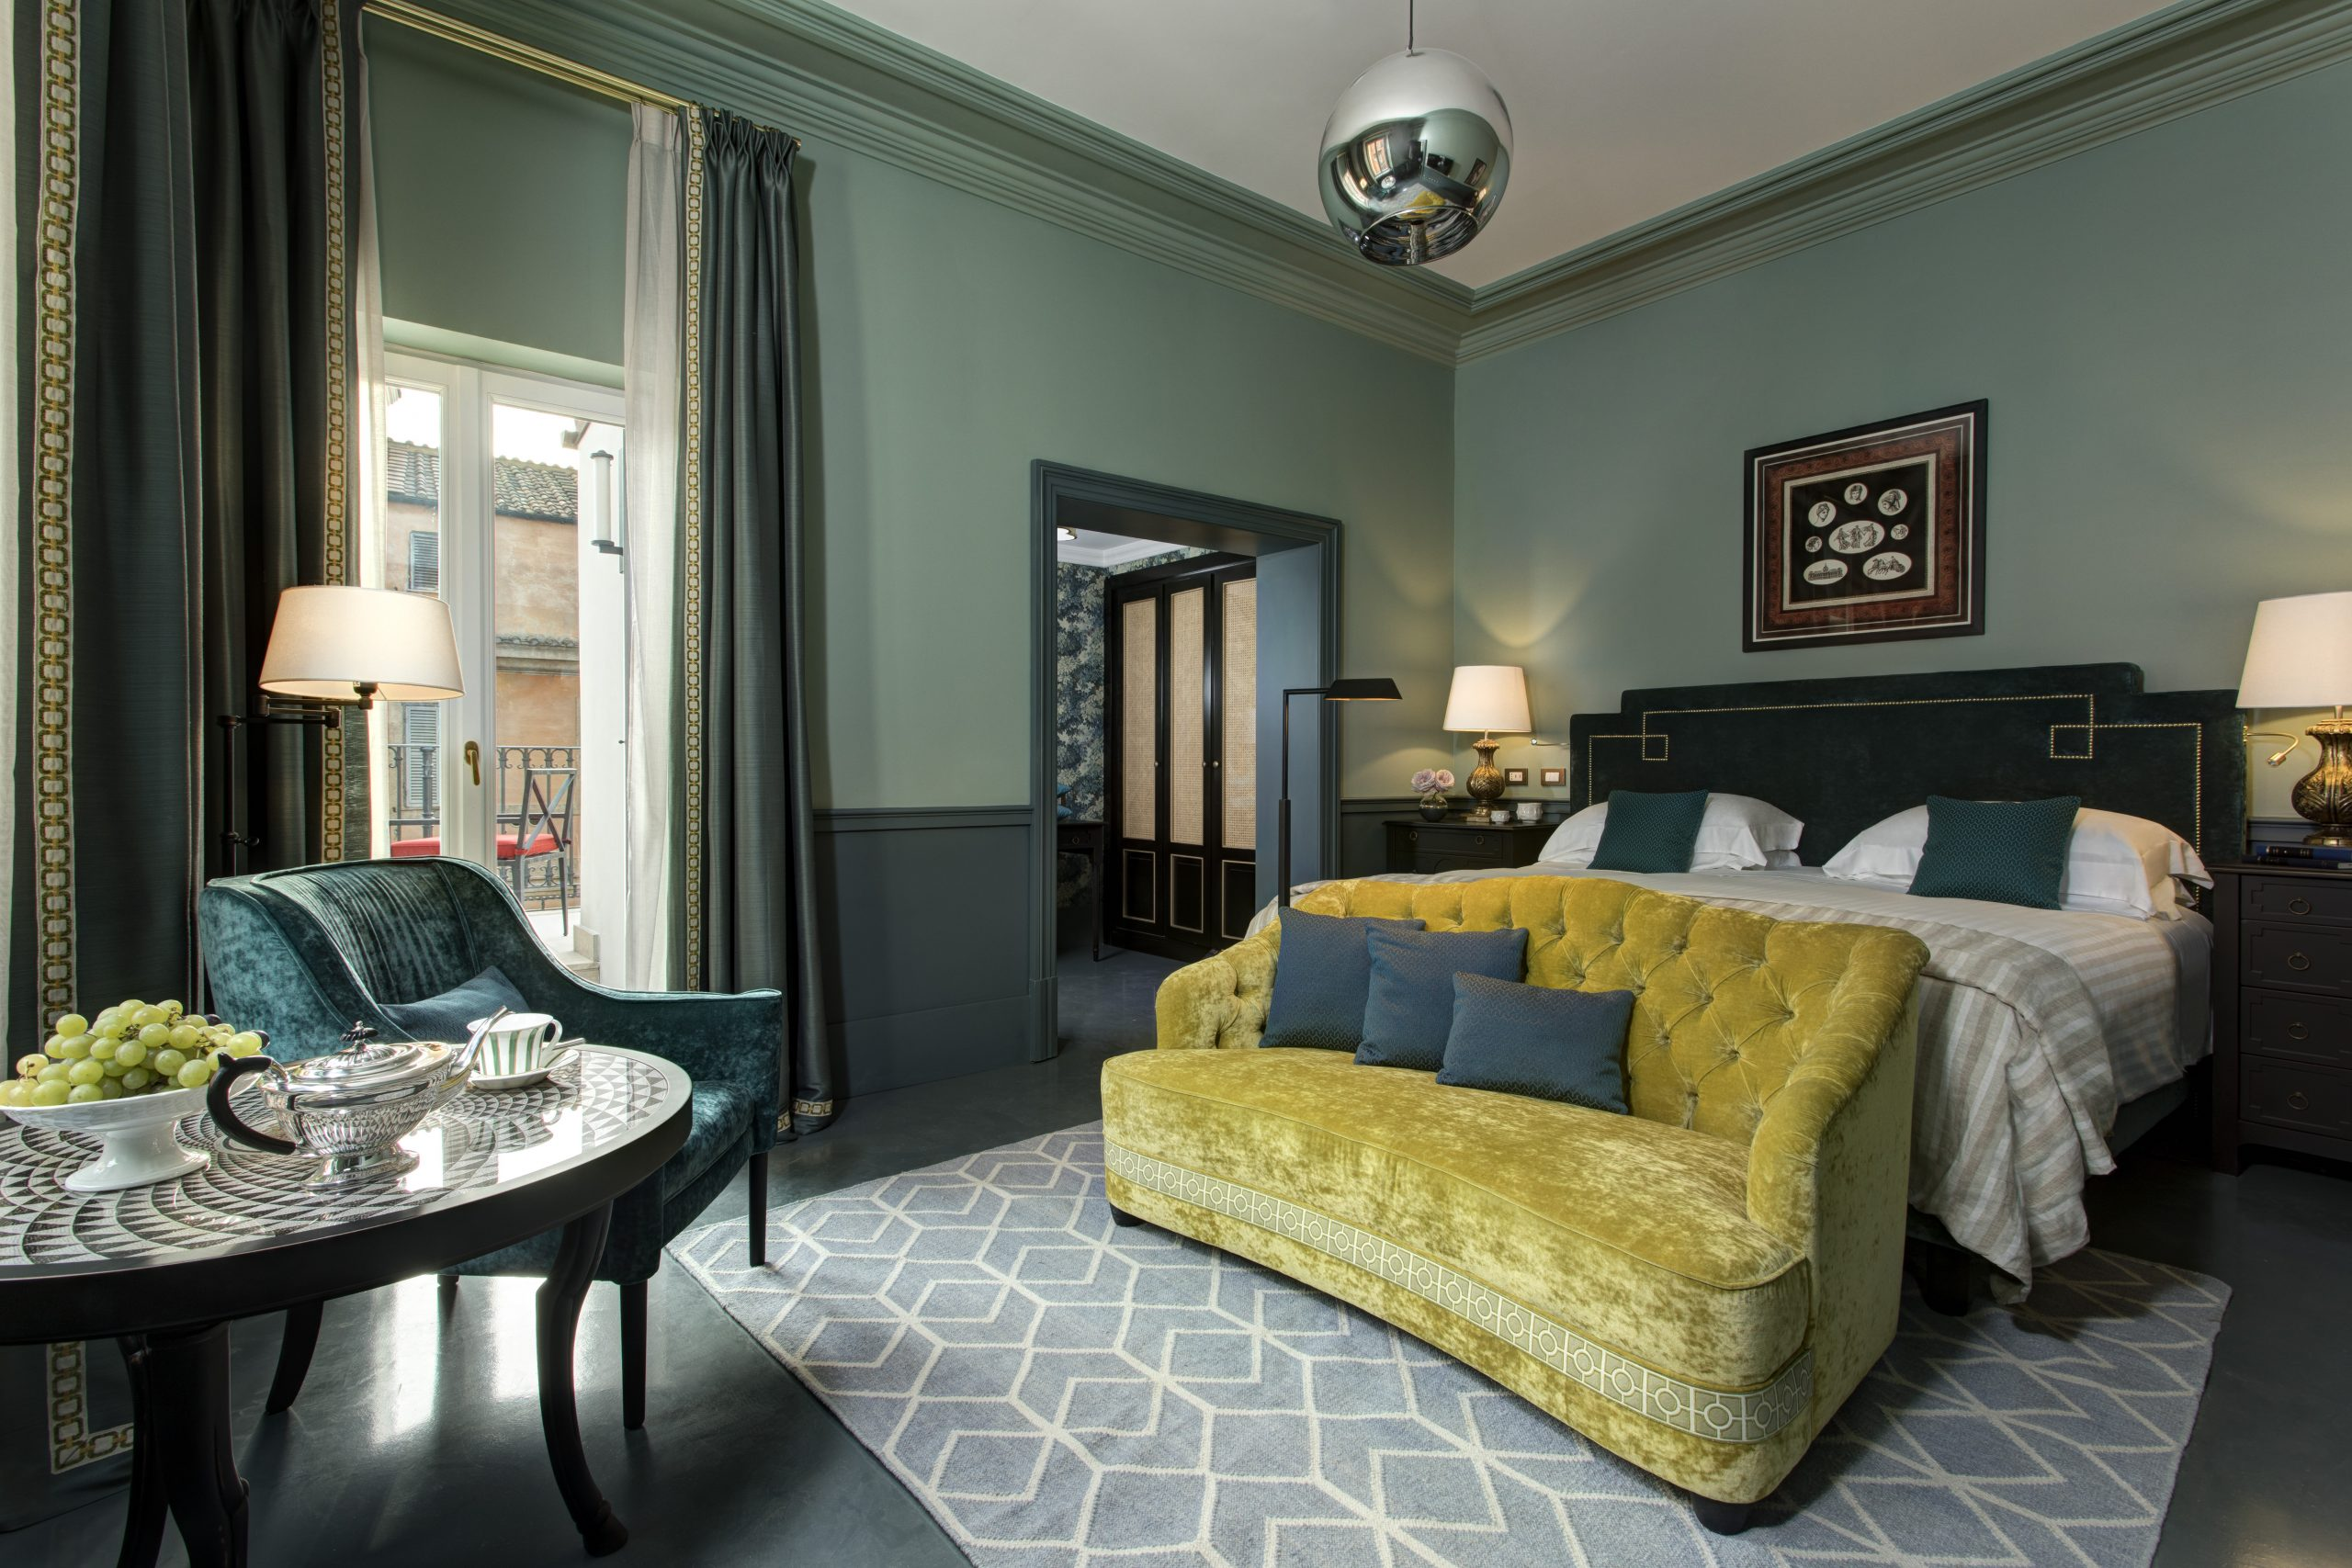 RFH Rocco Forte House - Medici Suite 0128 JG Sep 19